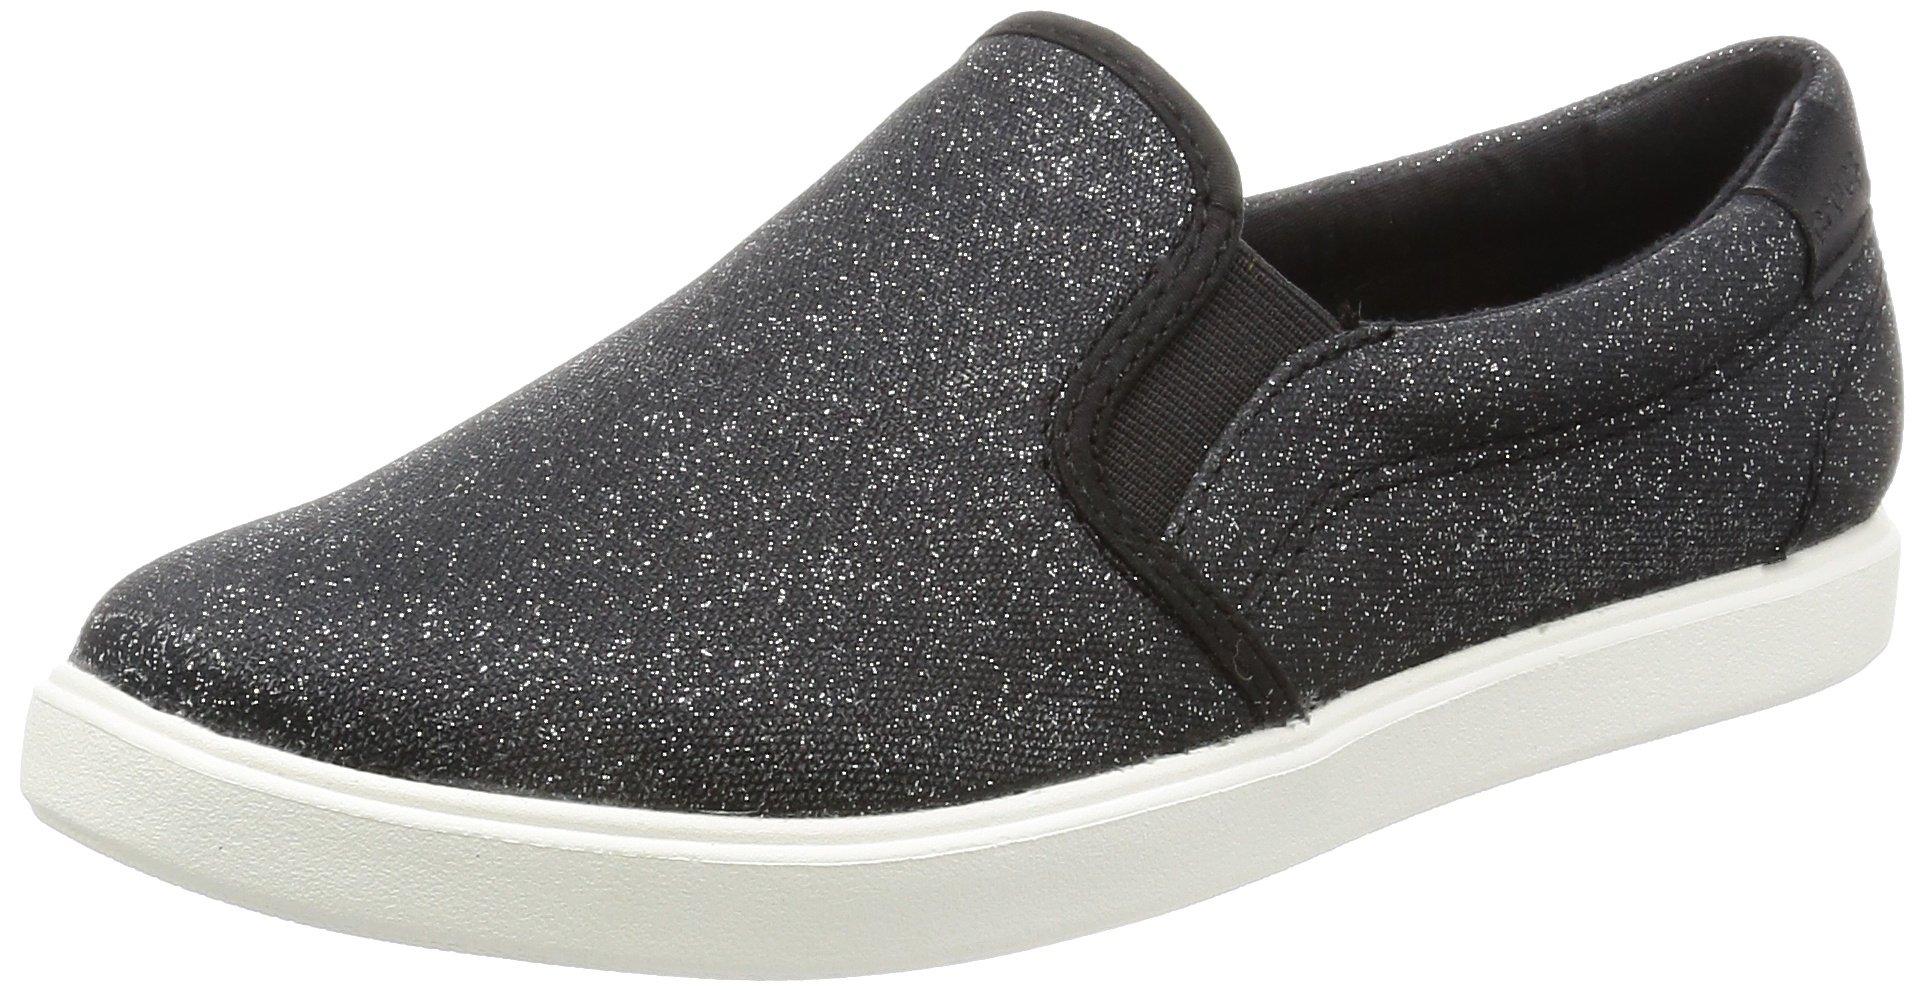 Crocs Women's Citilane Slip-on Fashion Sneaker, Black Shimmer, 8 M US